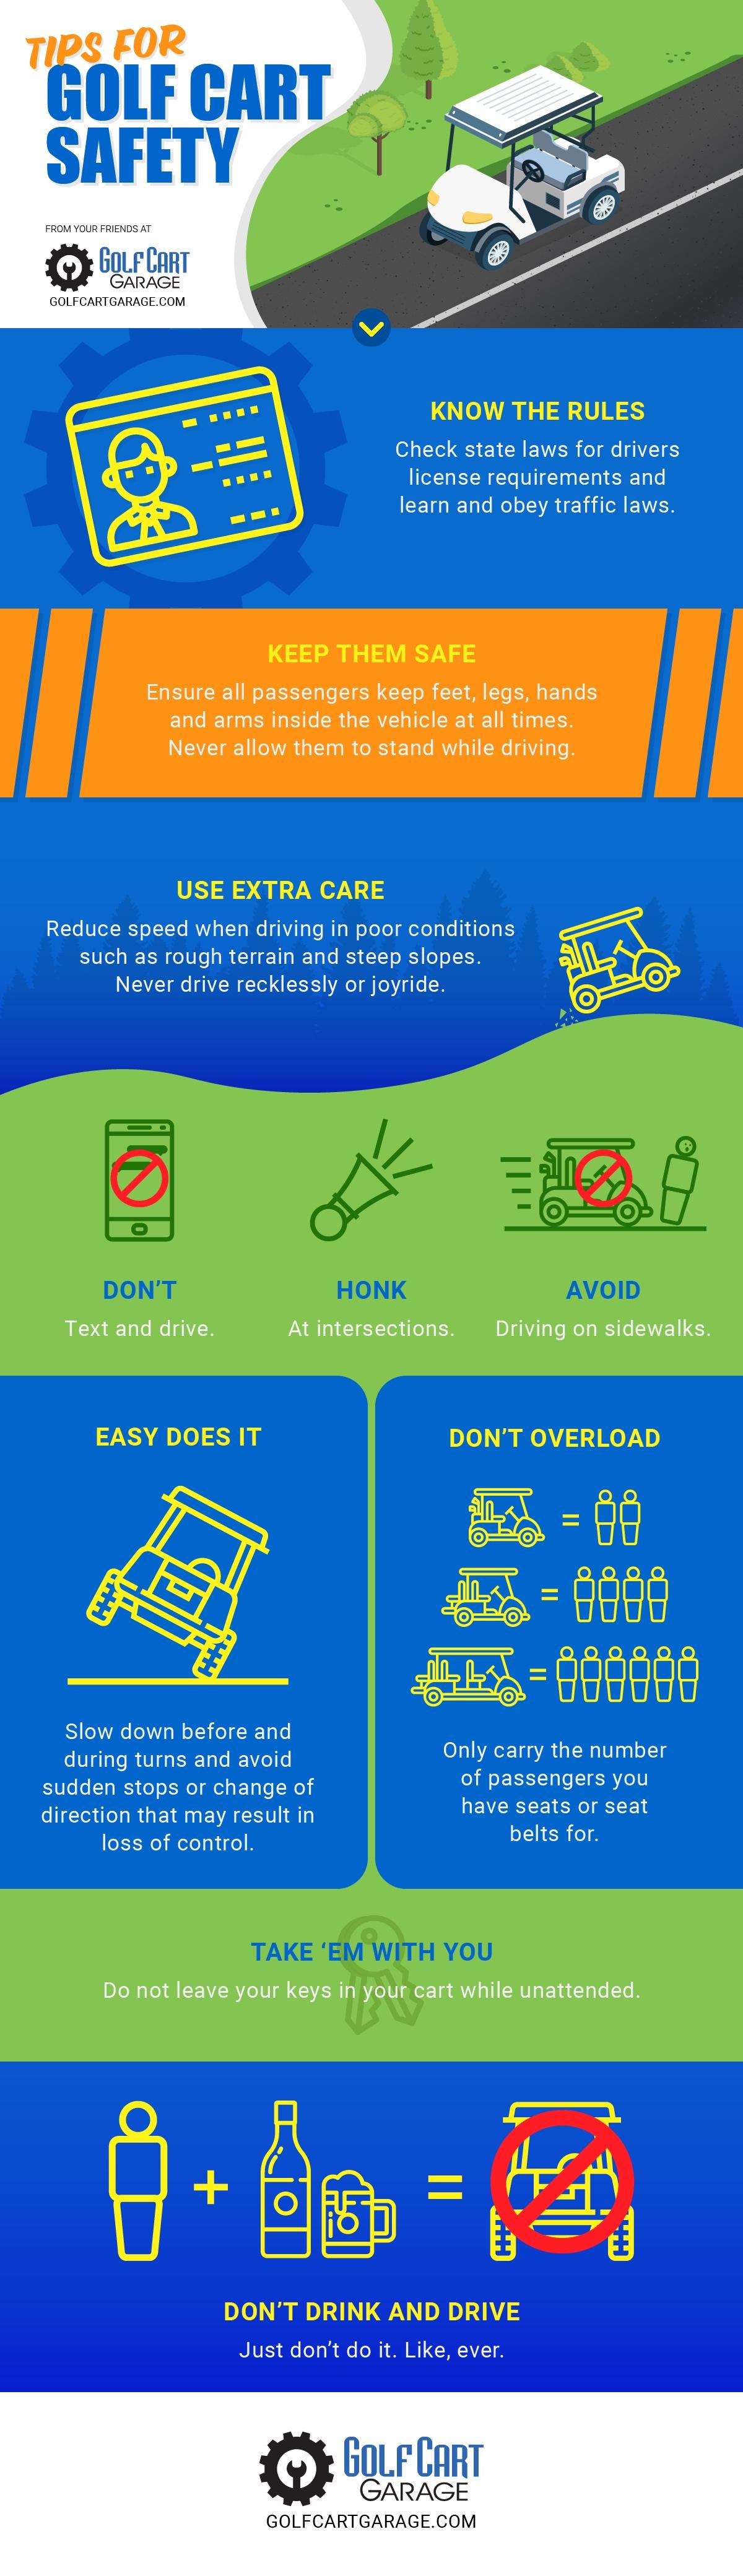 Golf Cart Safety Tips